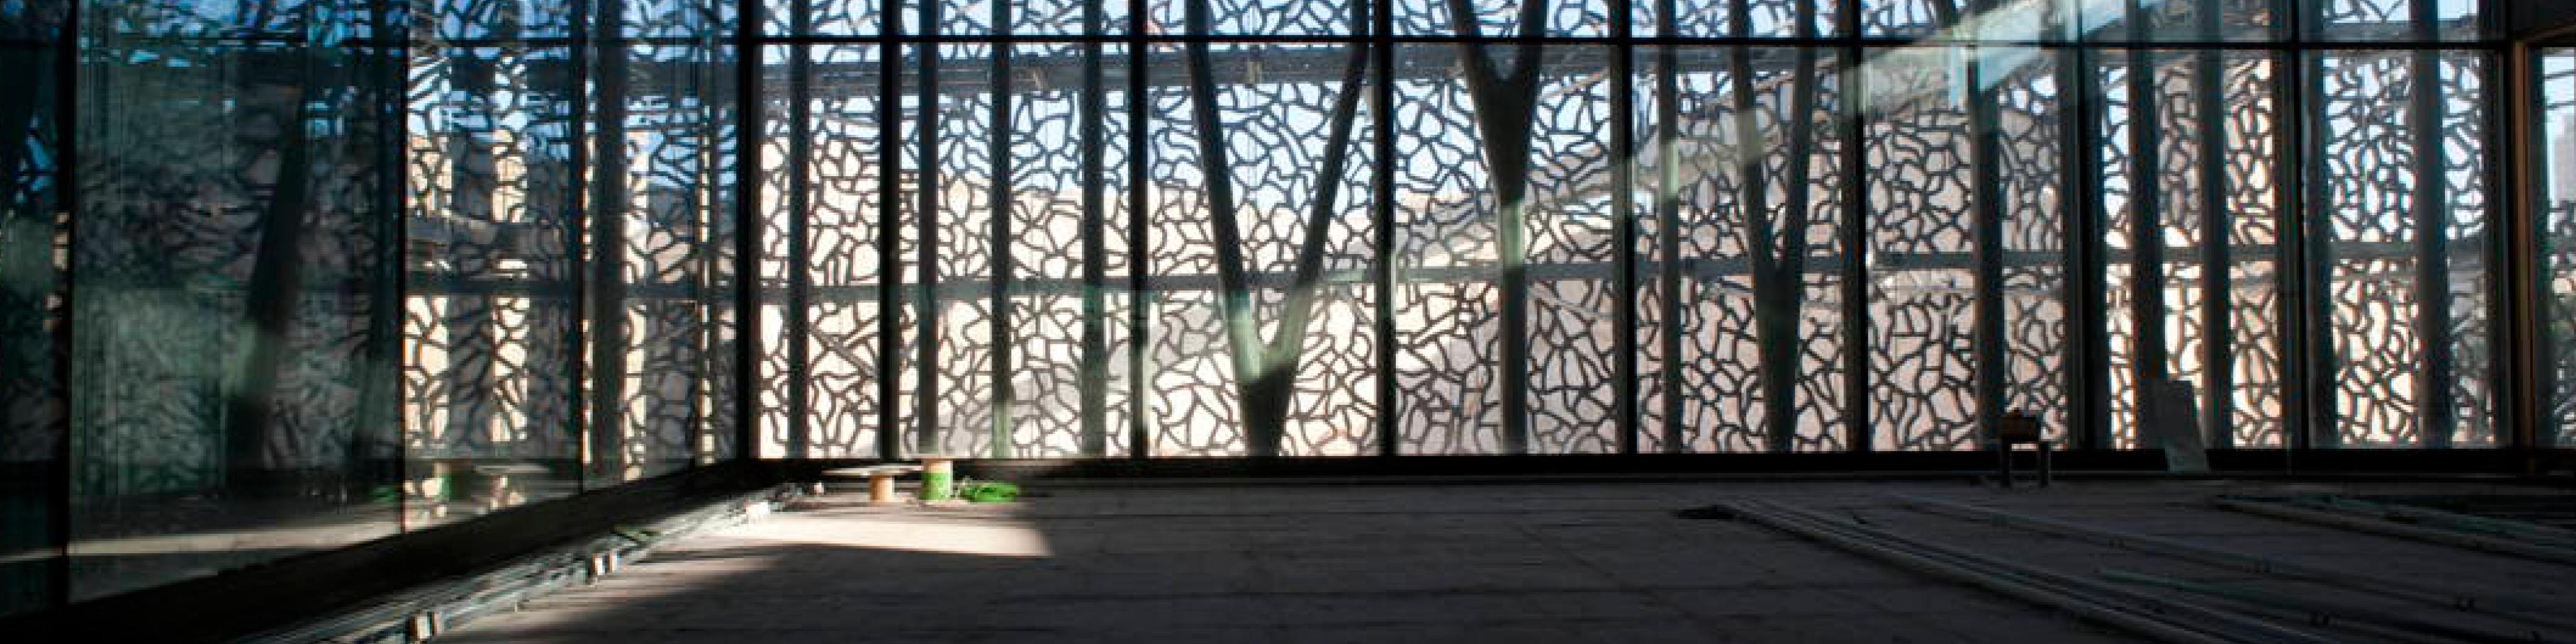 Texas Interior Design Architecture Landscape Continuing Education Requirements